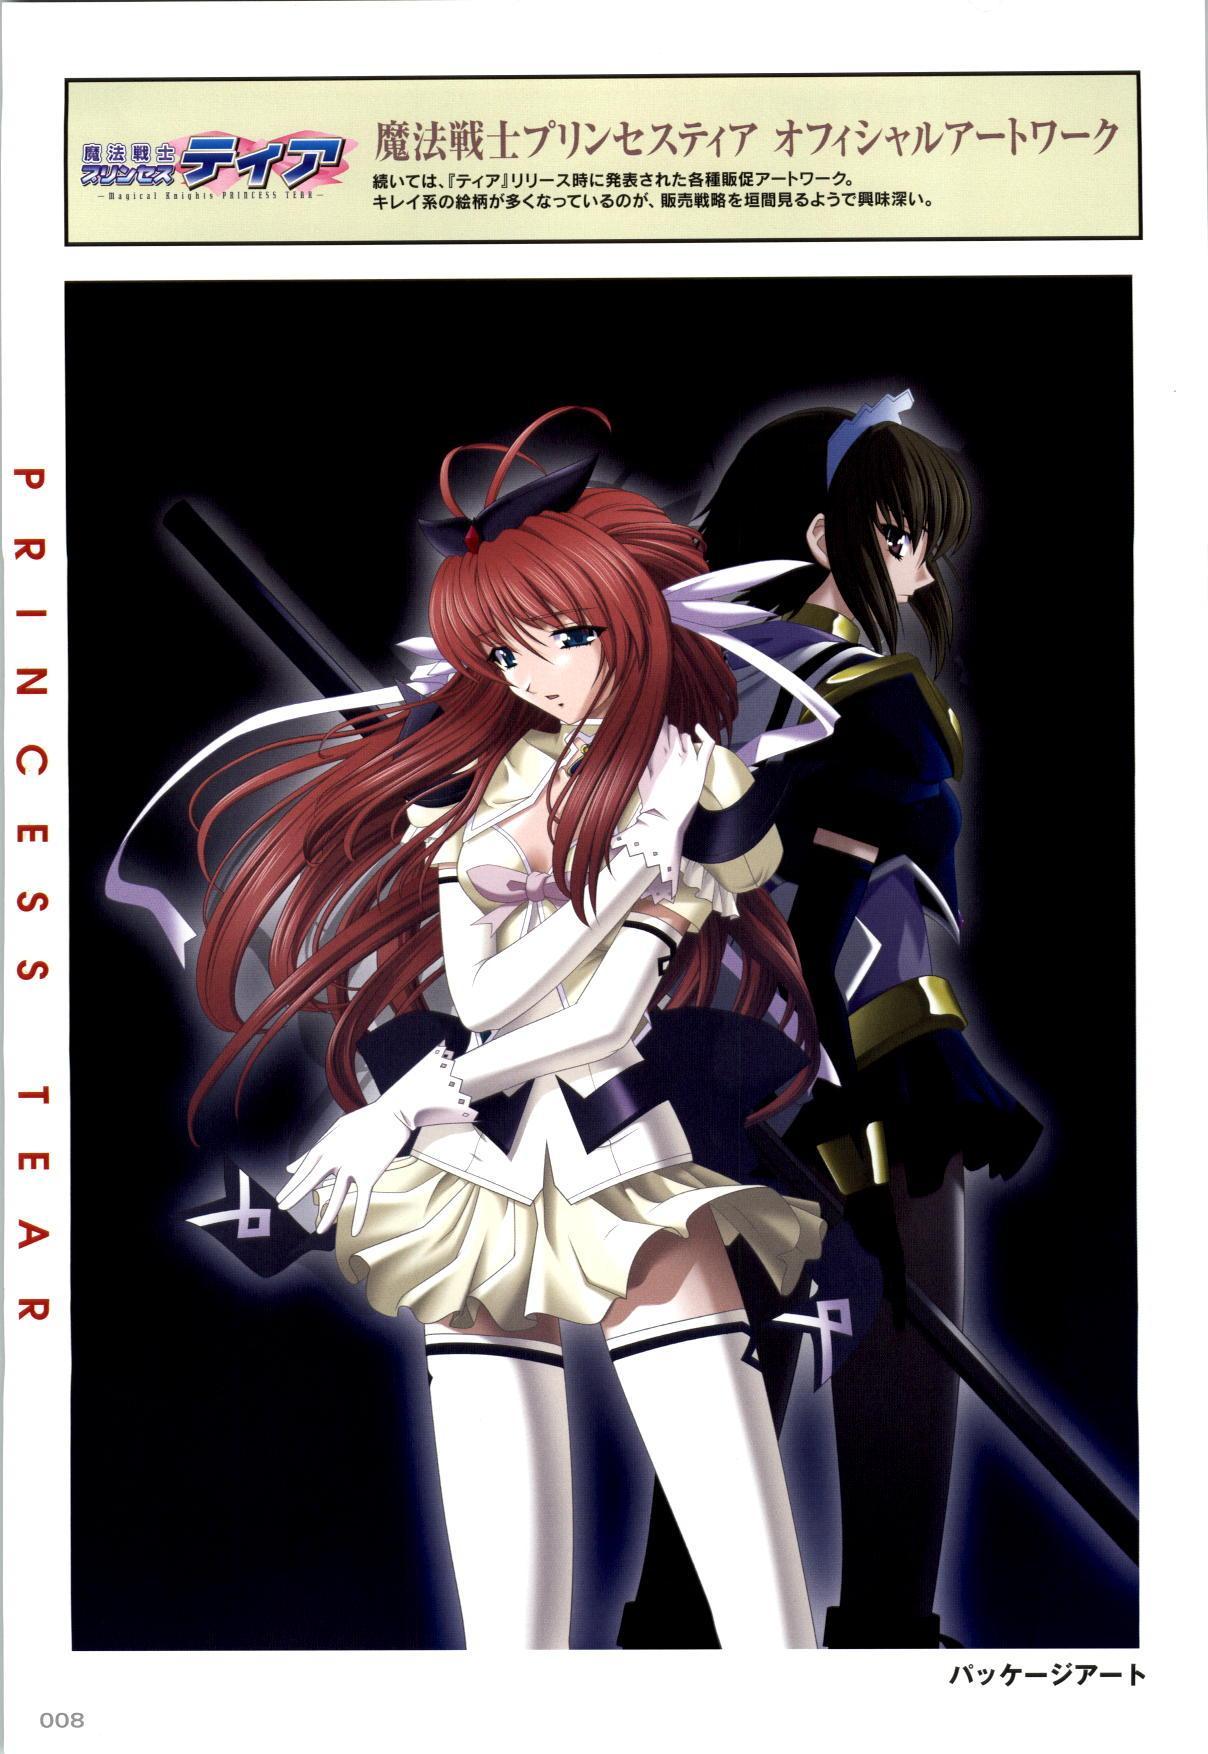 Mahou Senshi Sweet Knight & Mahou Senshi Princess Tear 7